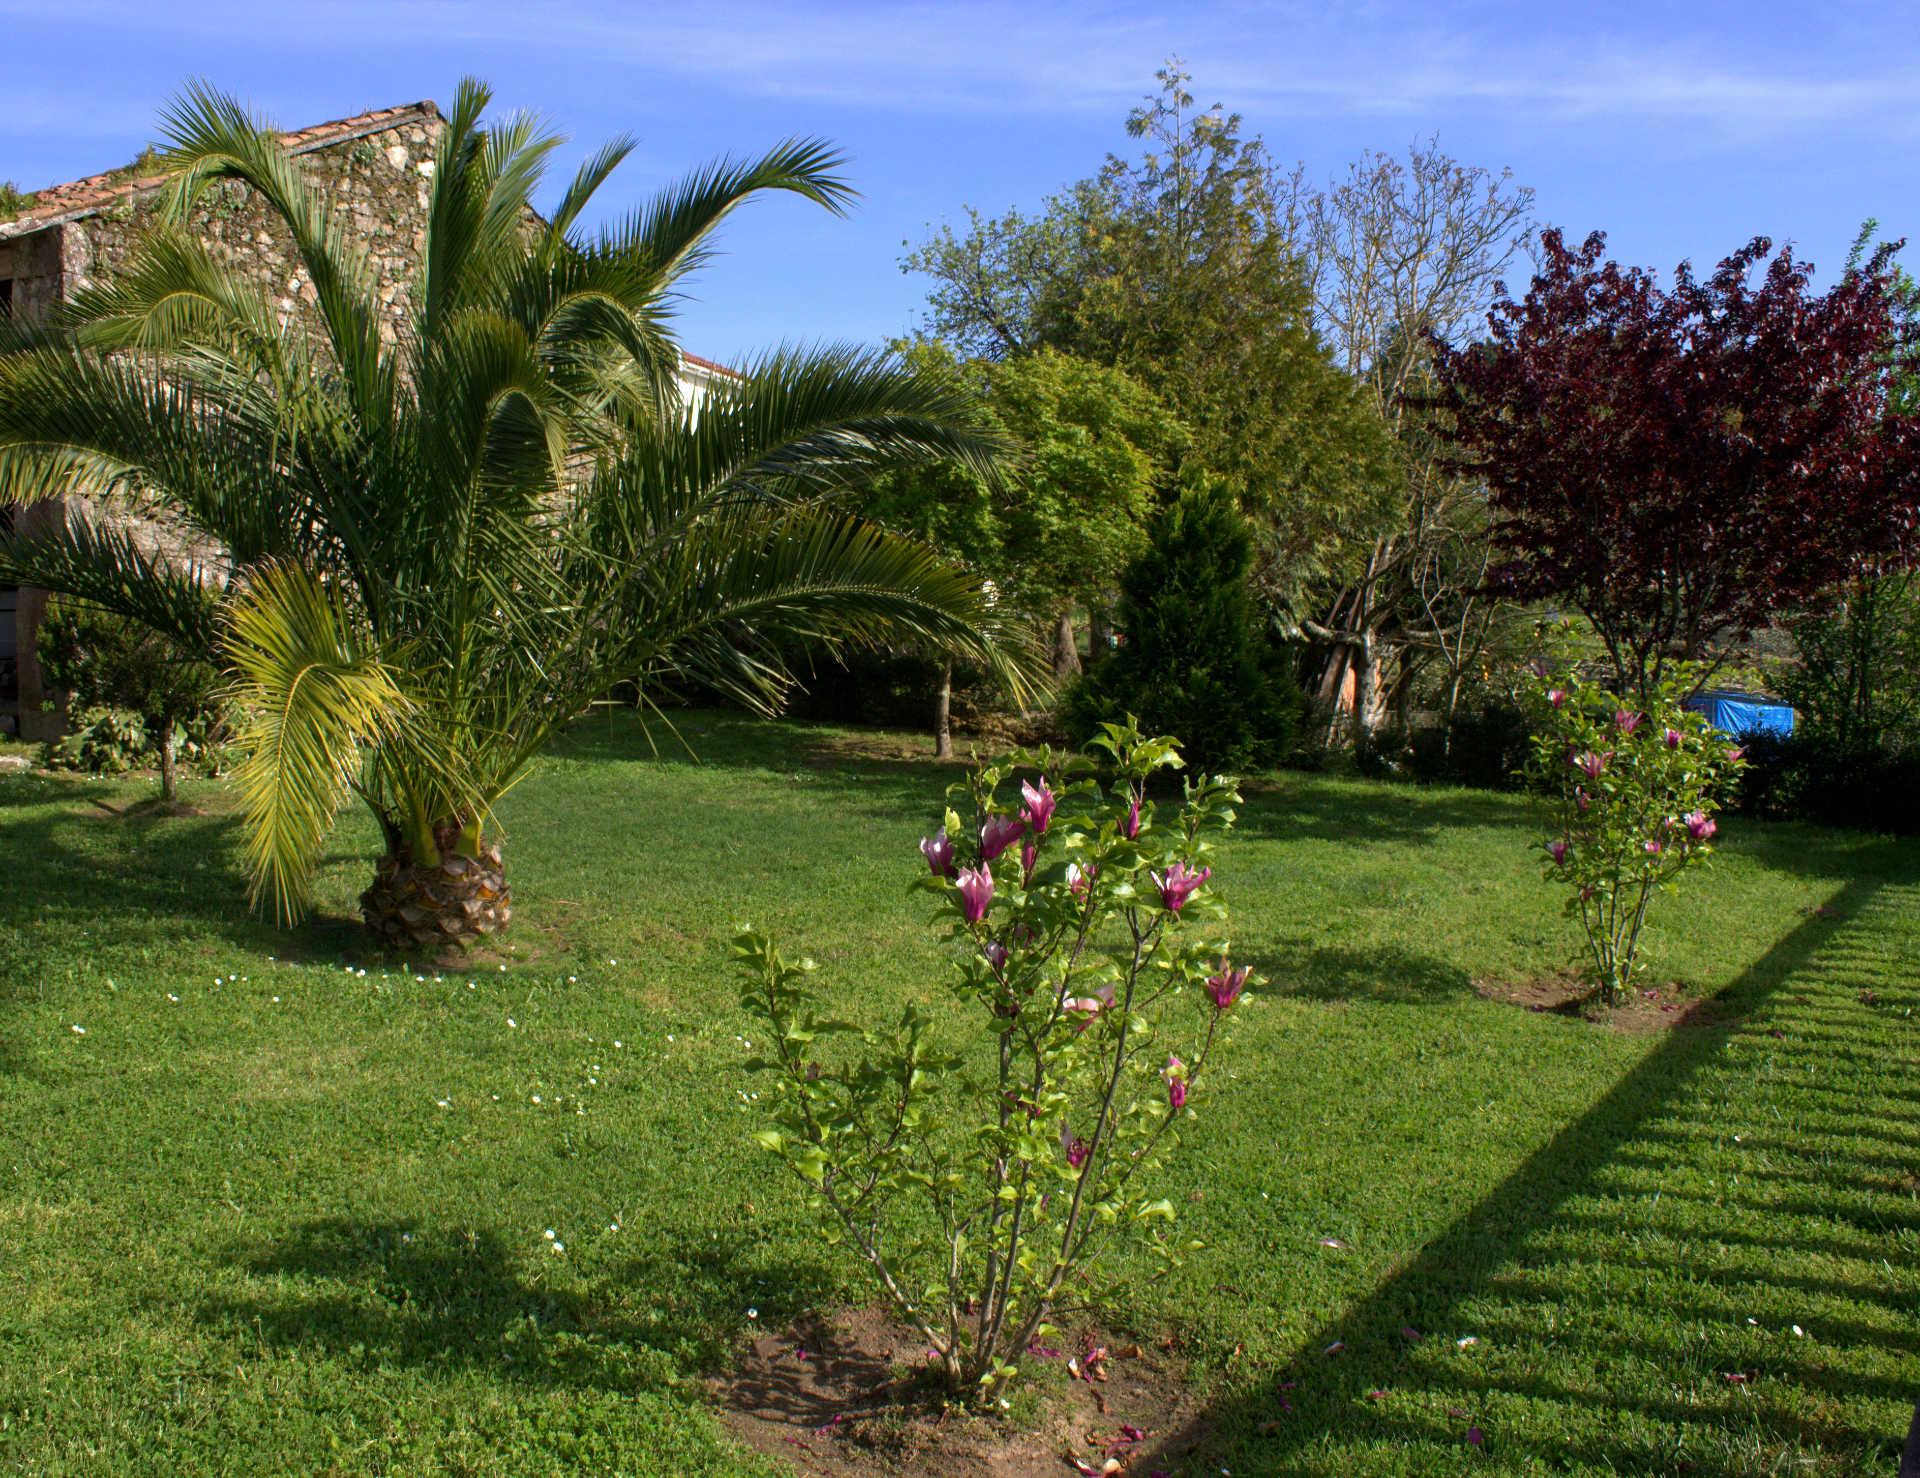 Jardines exteriores palmeras casa rural as seis chemineas